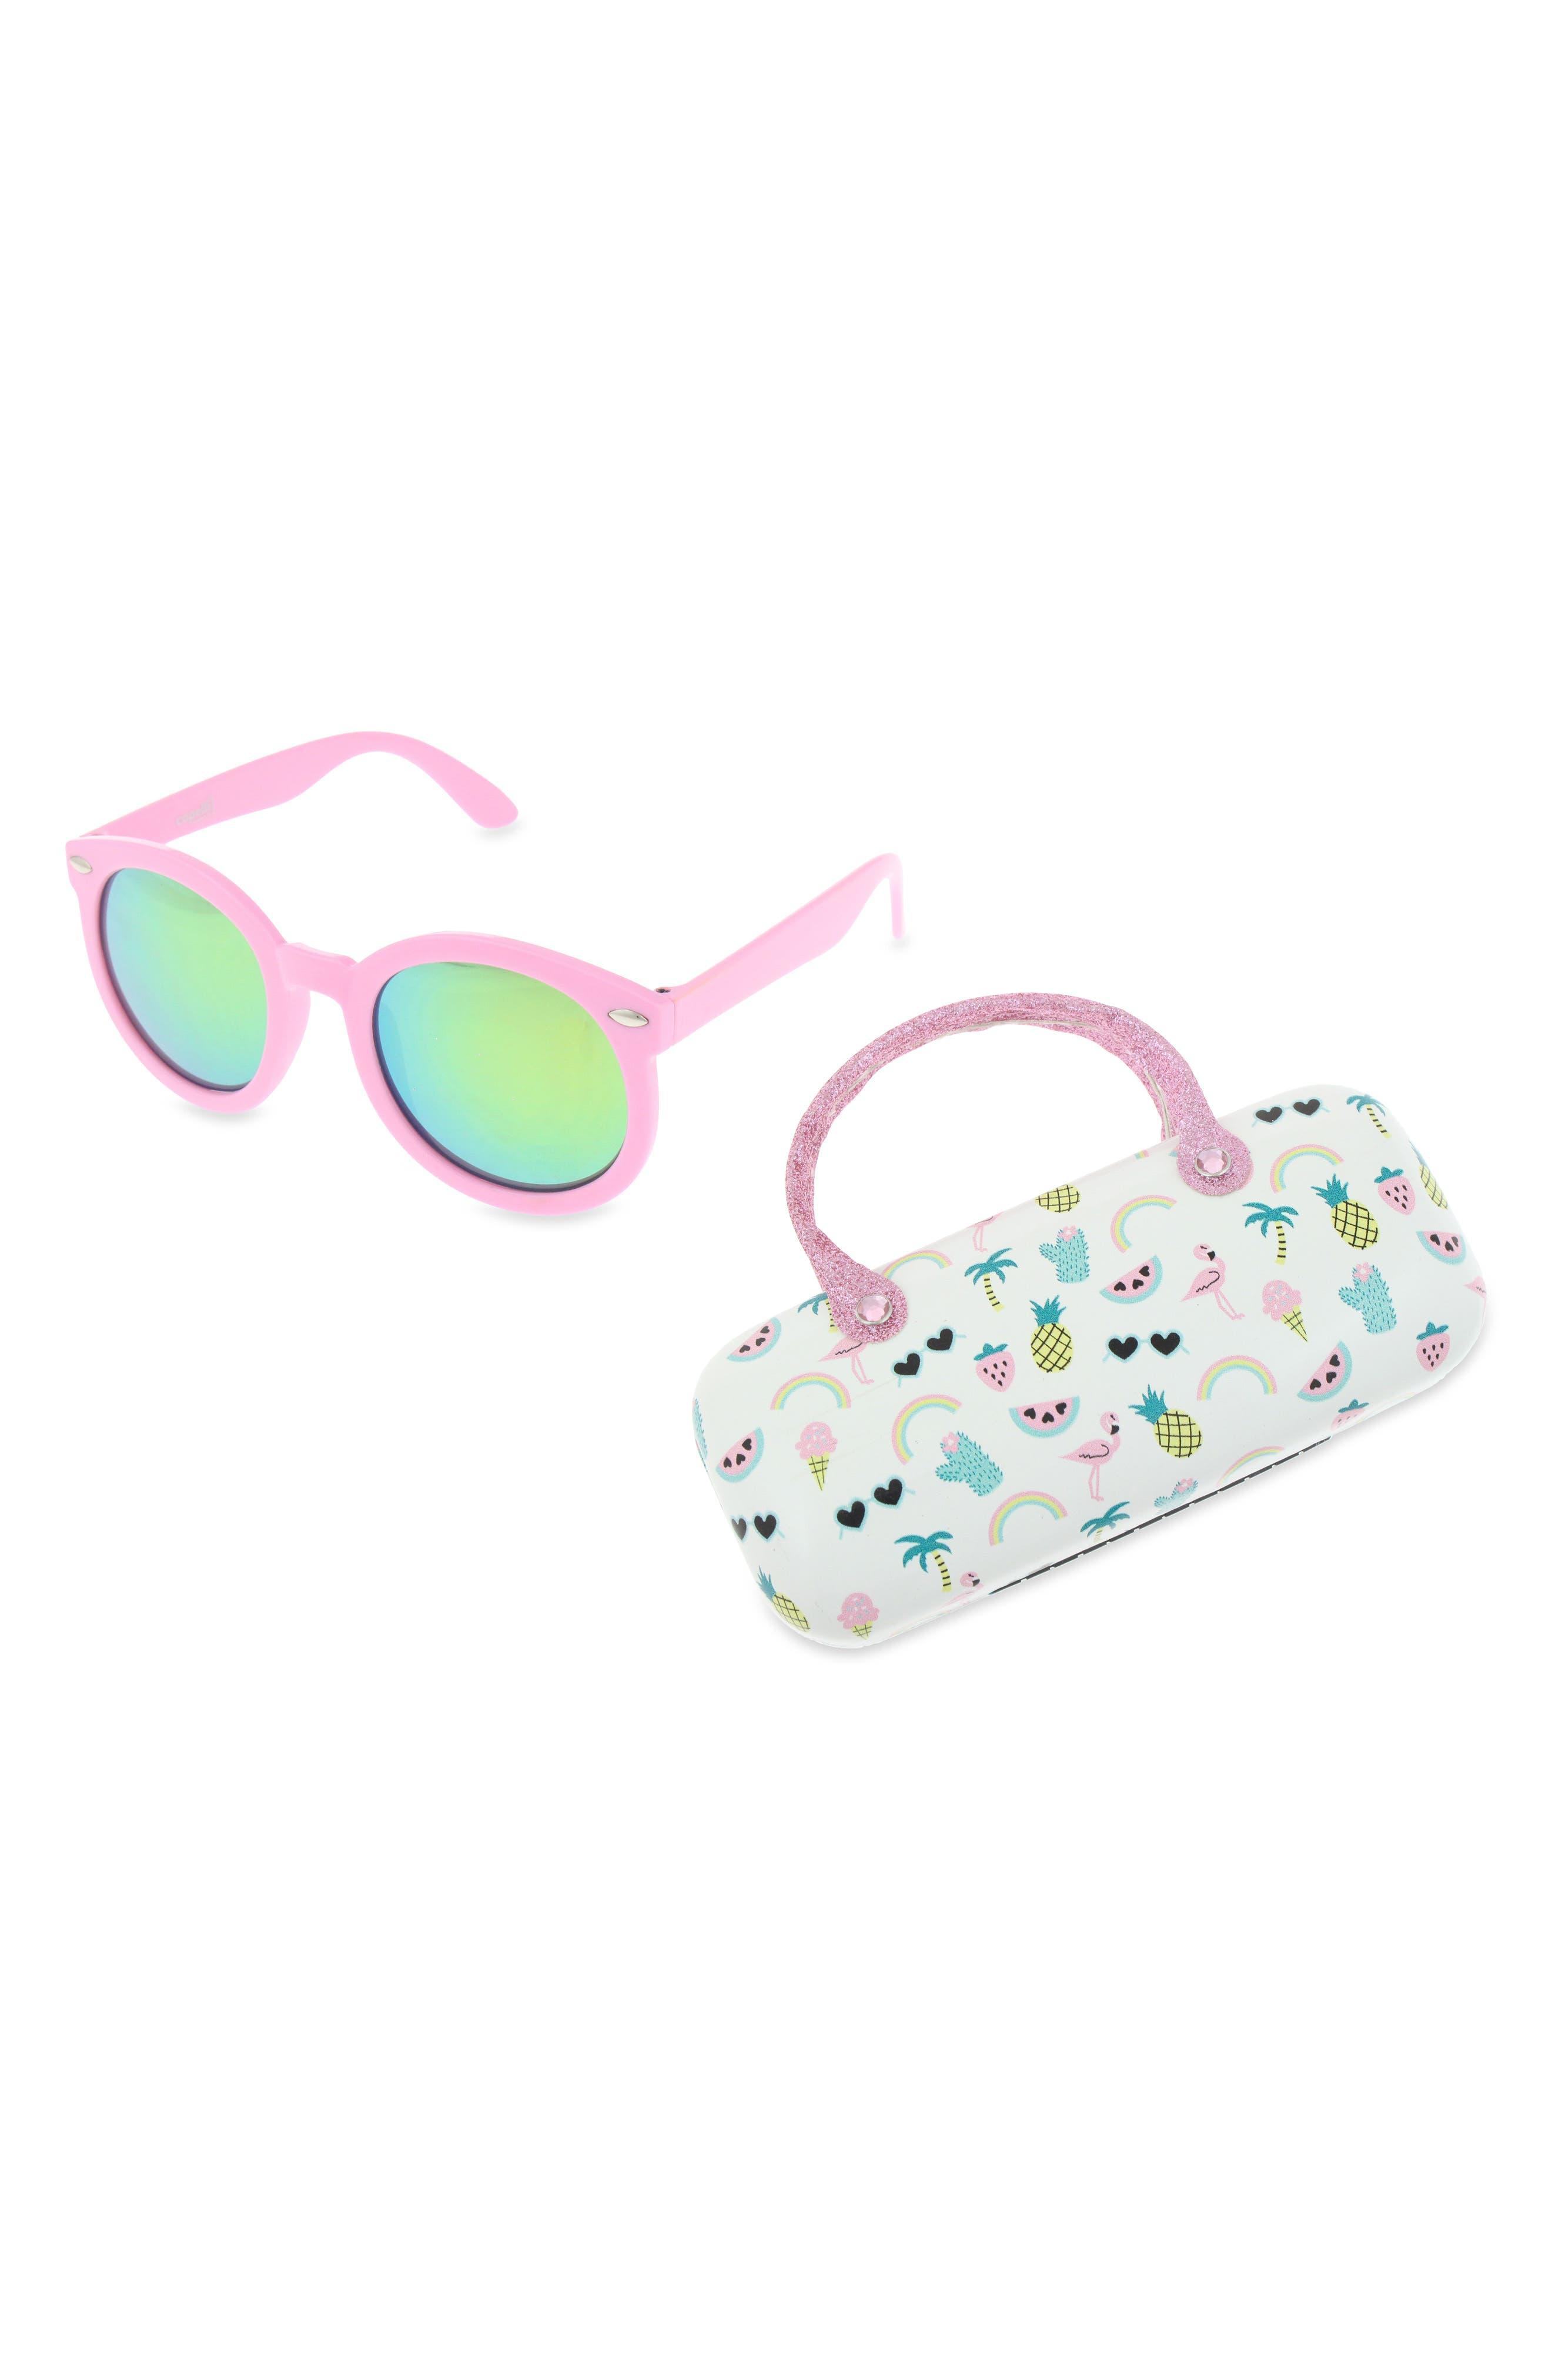 Summer Fun 60mm Sunglasses & Case Set,                         Main,                         color,